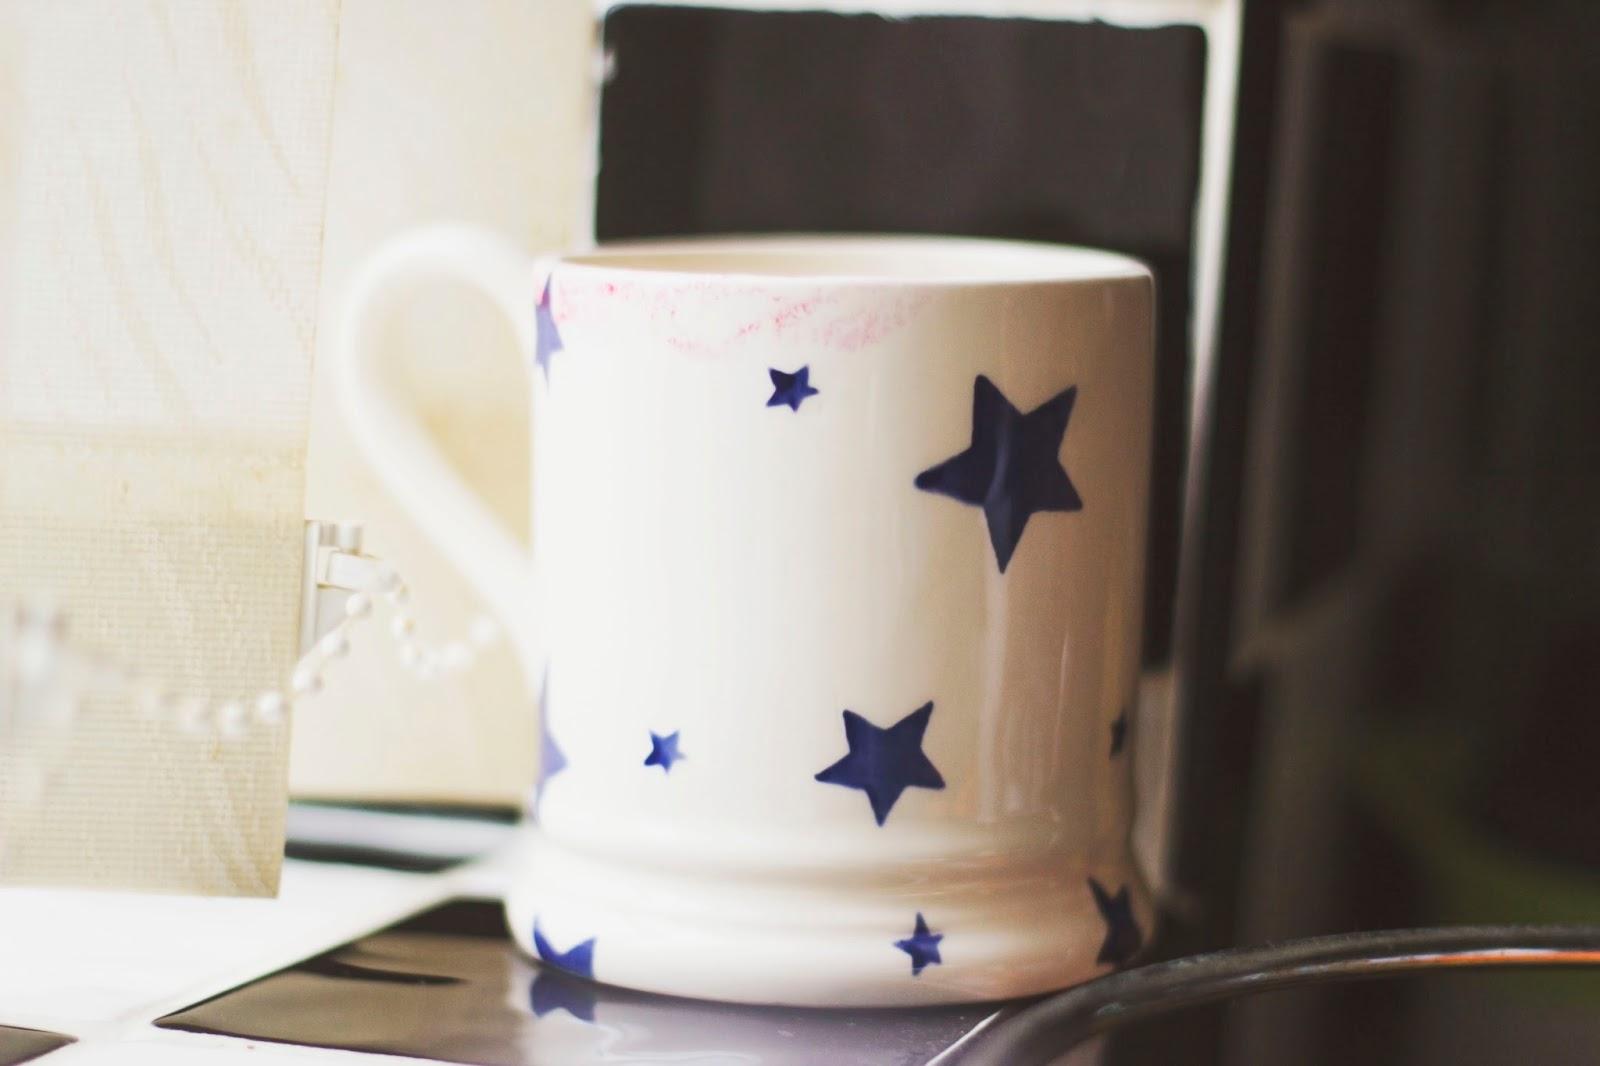 Emma Bridgewater Mug, Starry Skies, Ruby Woo Lipstick Marks, Katie Writes,